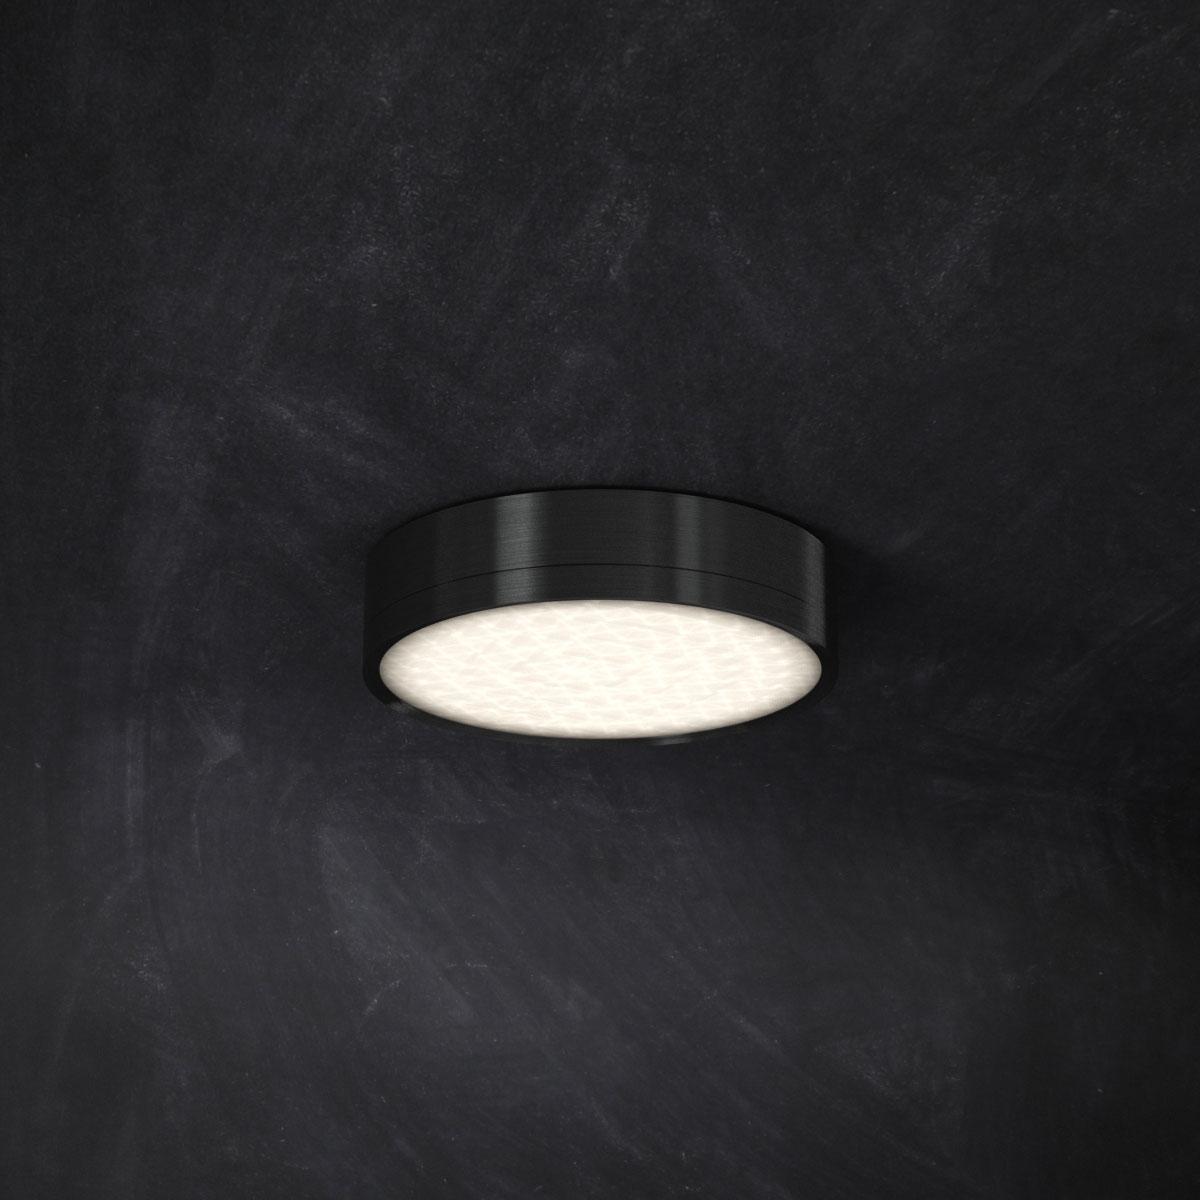 lamp 02 AM152